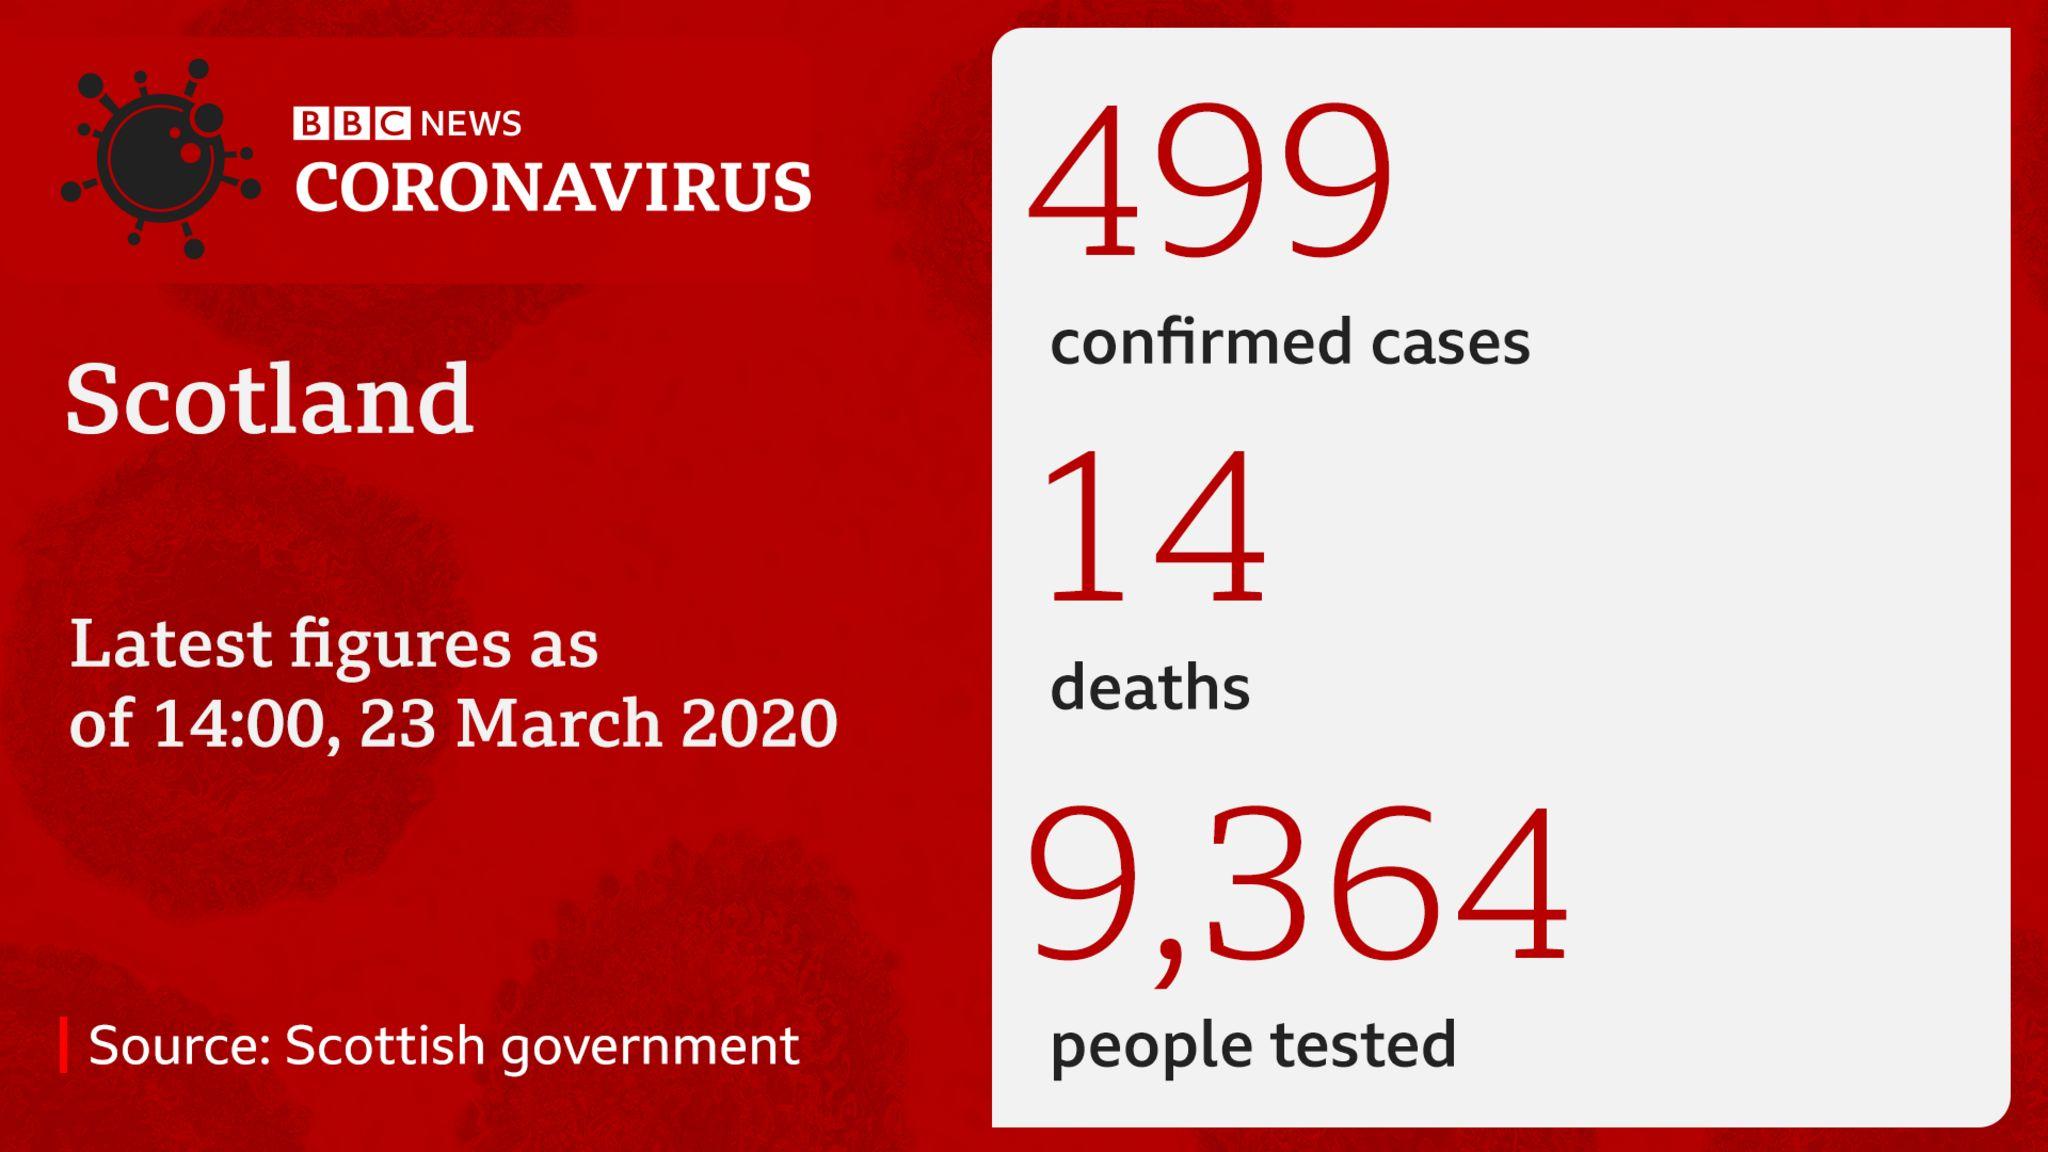 Coronavirus cases in Scotland